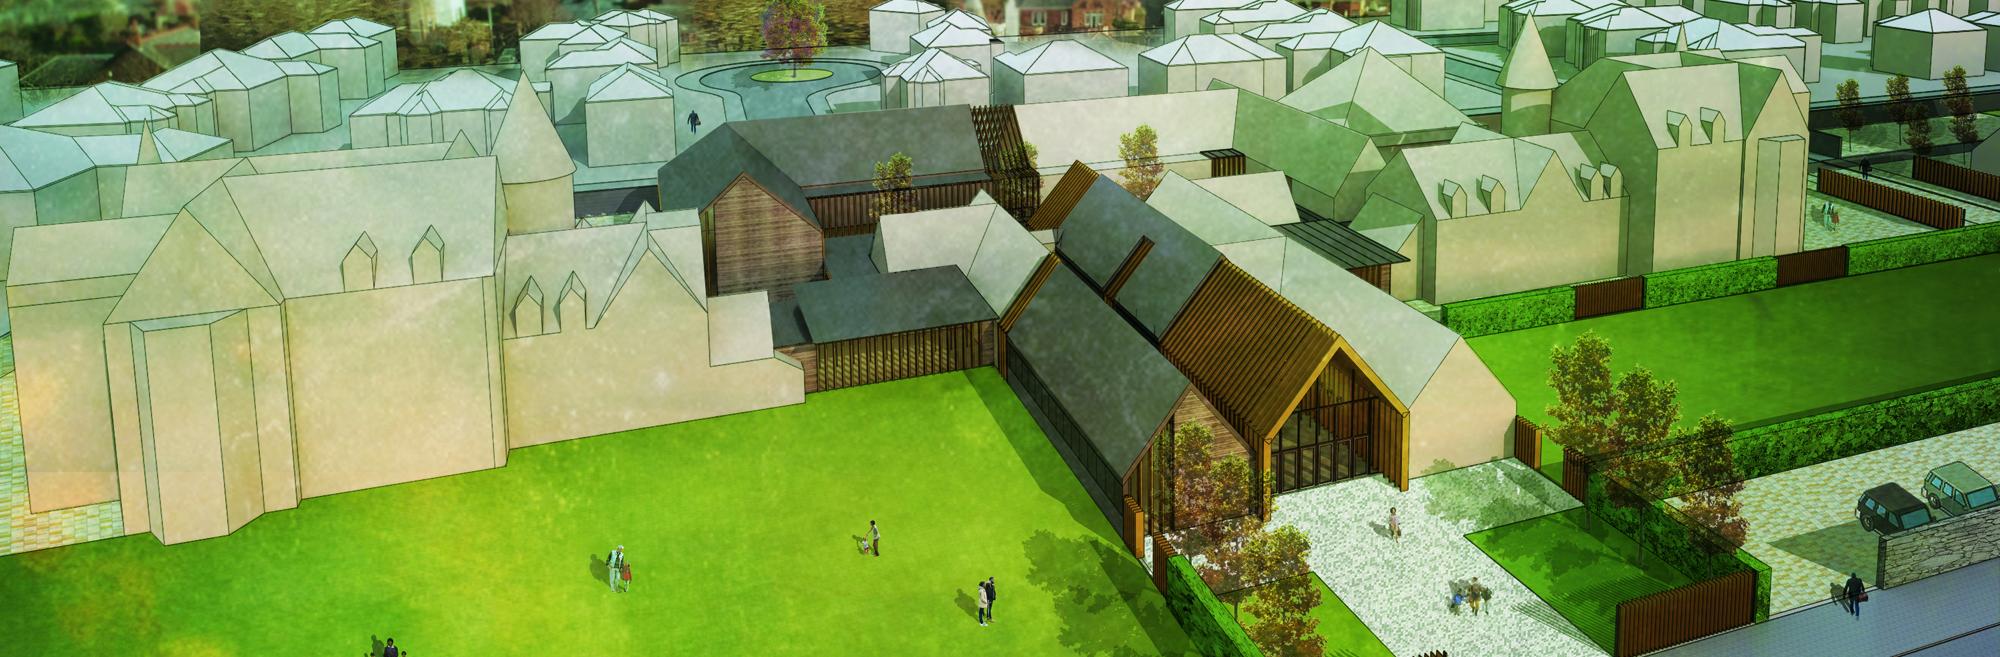 Wellington School Campus Masterplan